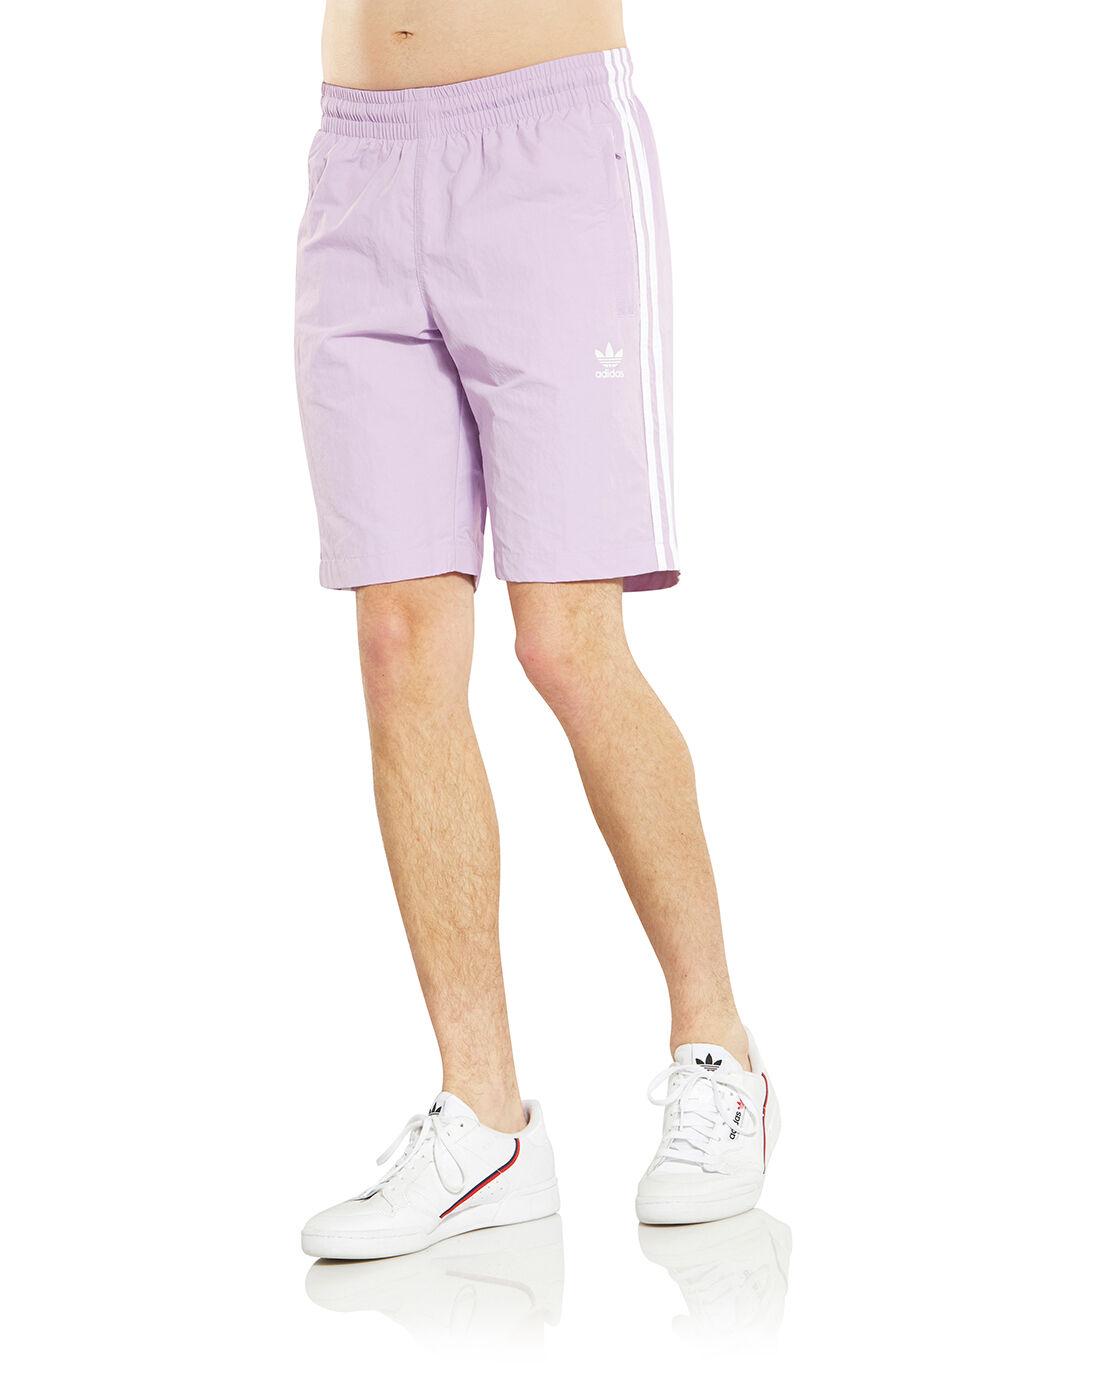 Adidas Originals Mens Short 3 Stripes Swim gb6yvIYf7